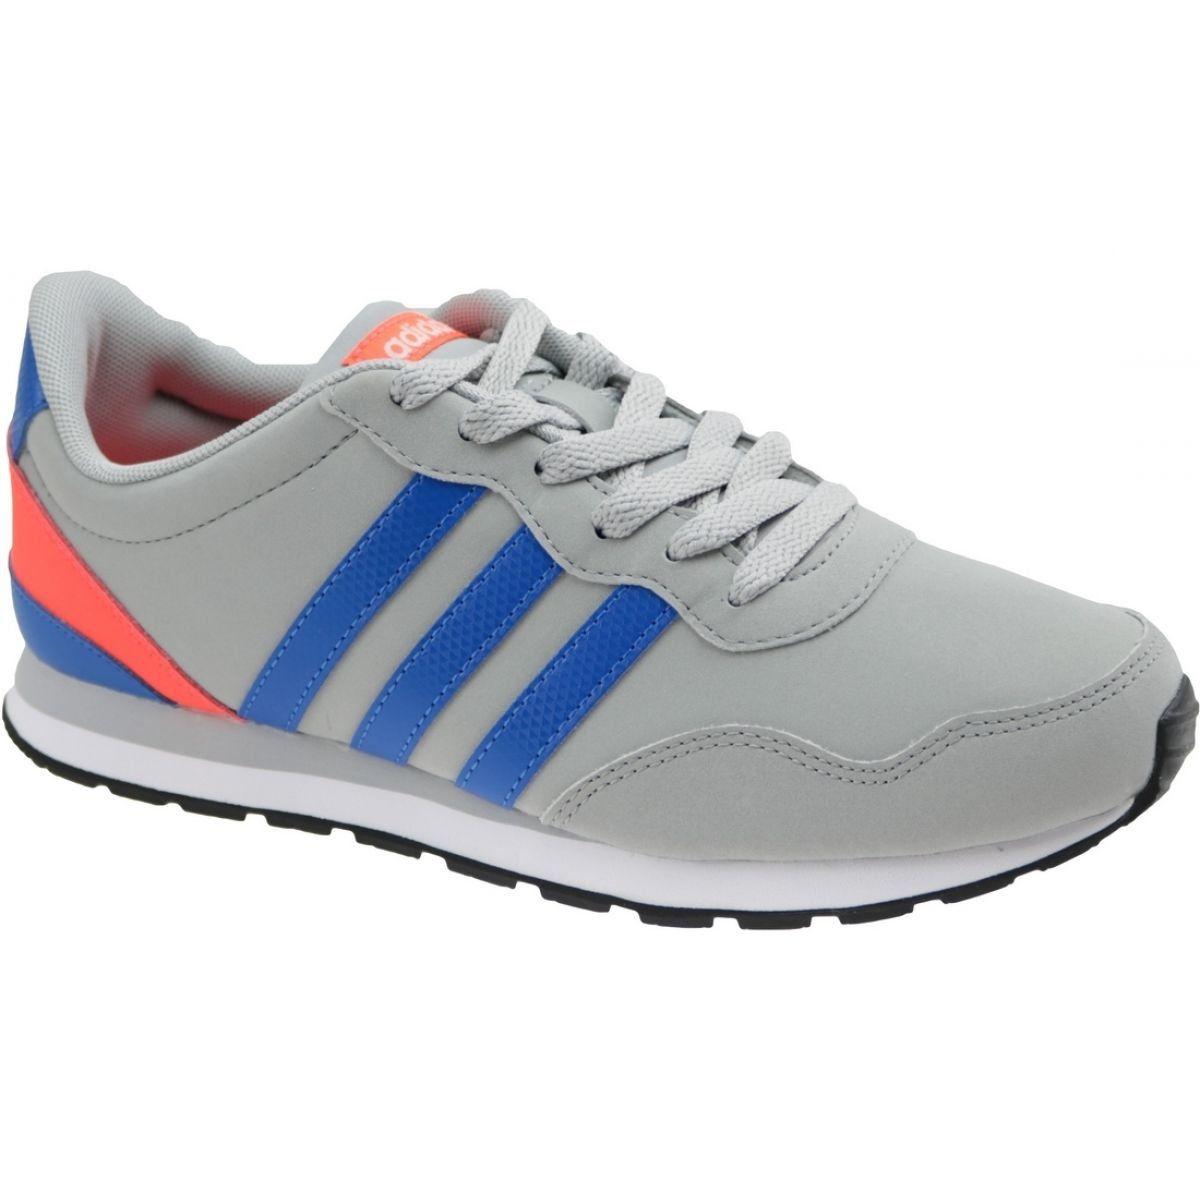 Buty Adidas V Jog K Jr Aw4147 Szare Adidas Brand Shoes Sports Shoes Adidas